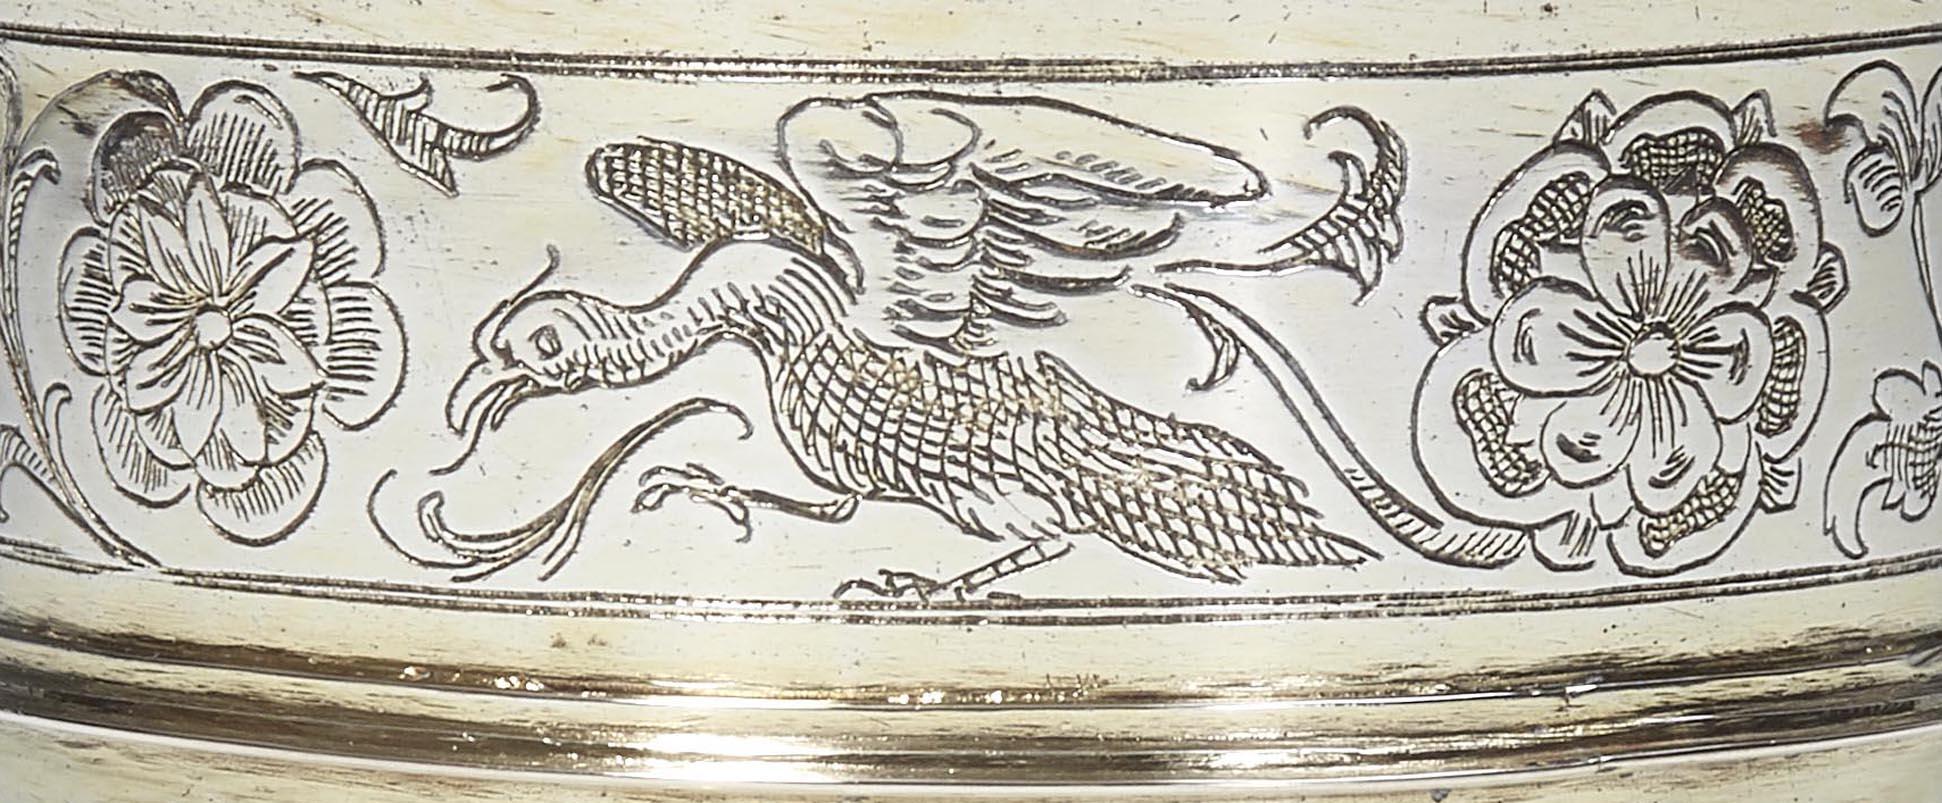 Nürnberger Fußbecher Detailansicht des oberen Becherrandes